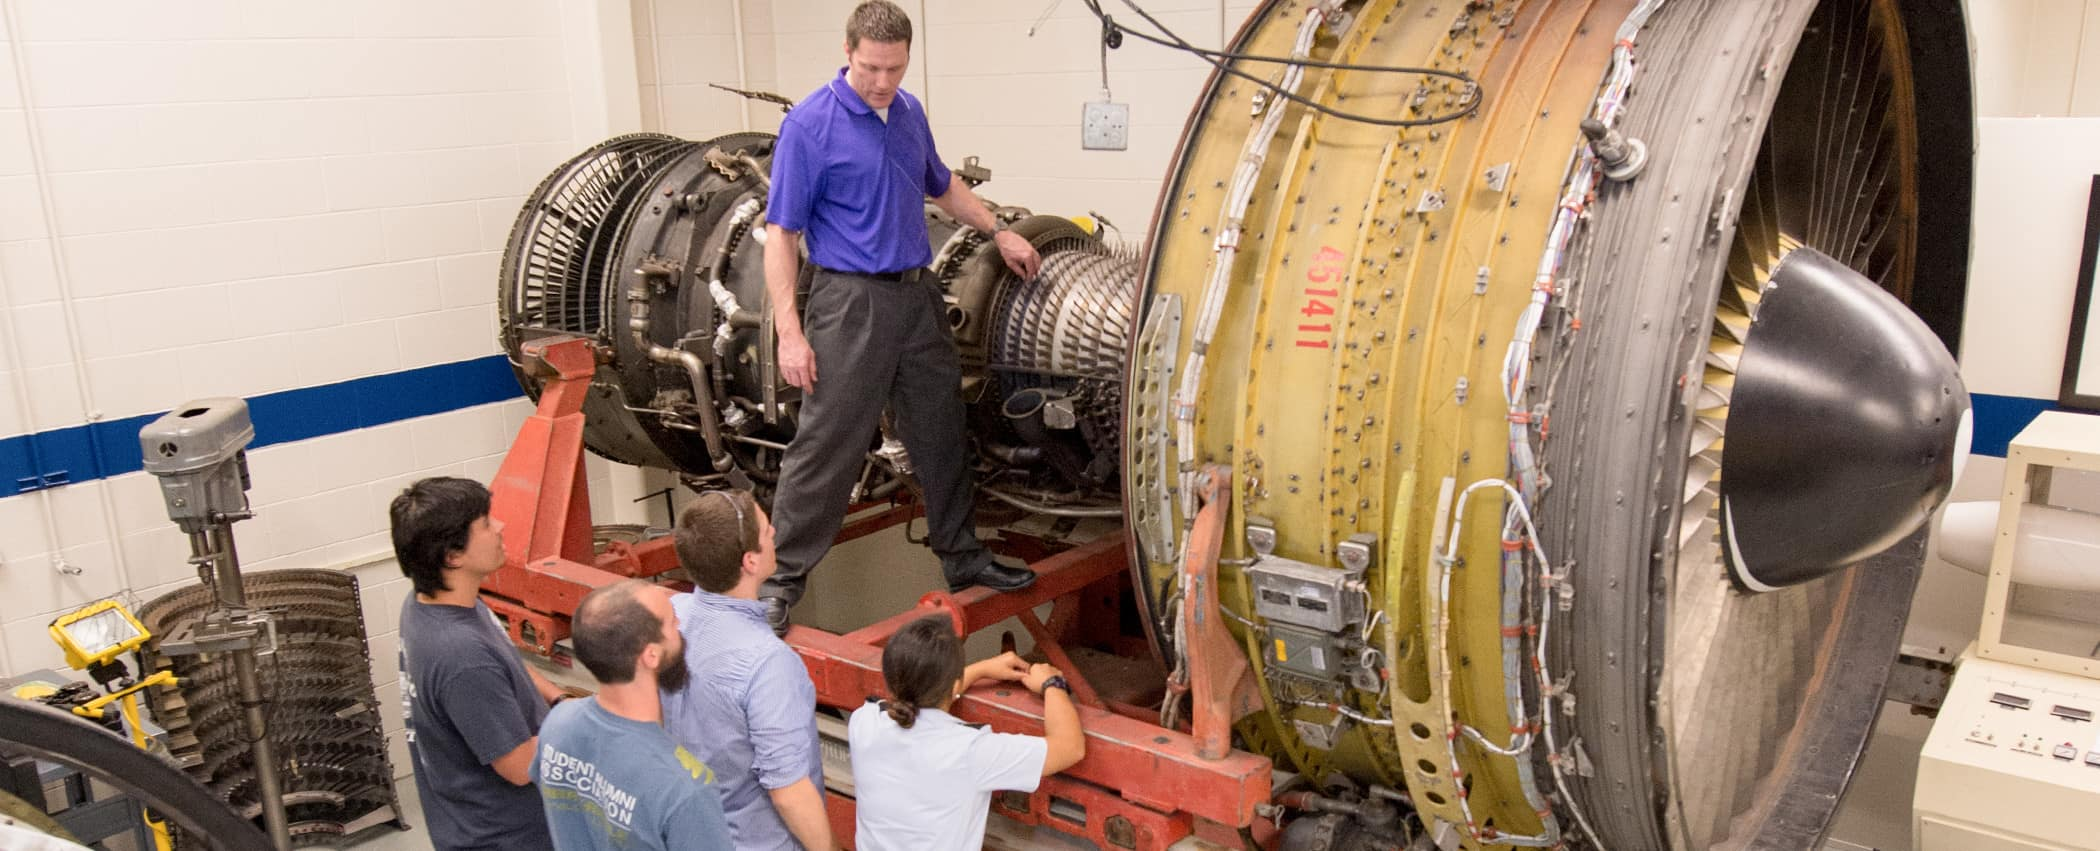 Engineer Aerospace Engineering